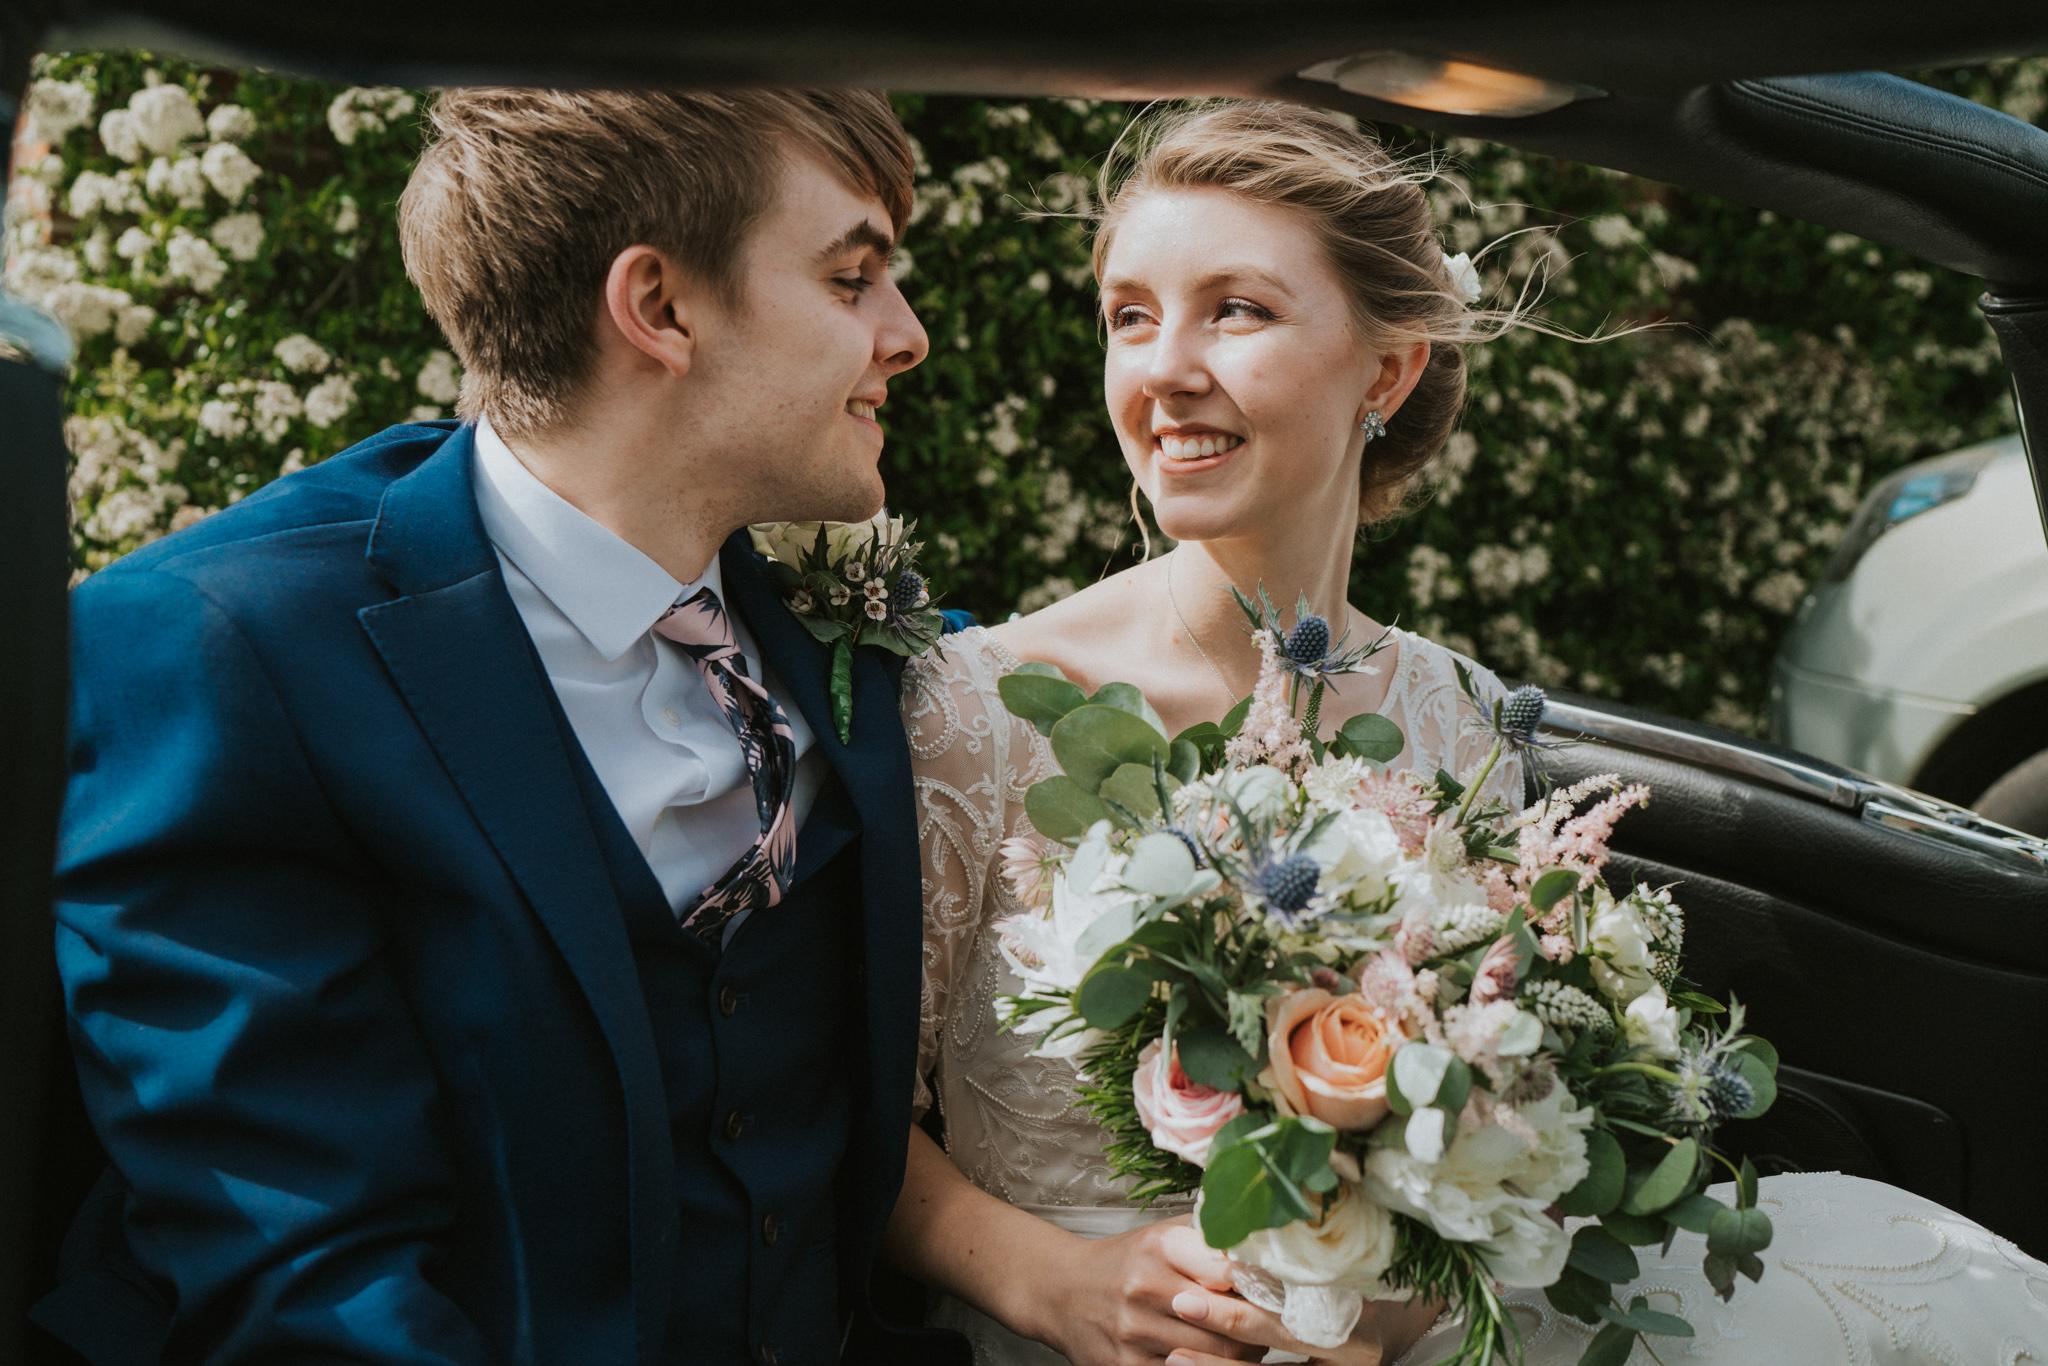 Jess-and-Tom-Norfolk-Alternative-Wedding-Essex-Wedding-Photographer-Grace-Elizabeth-15.jpg